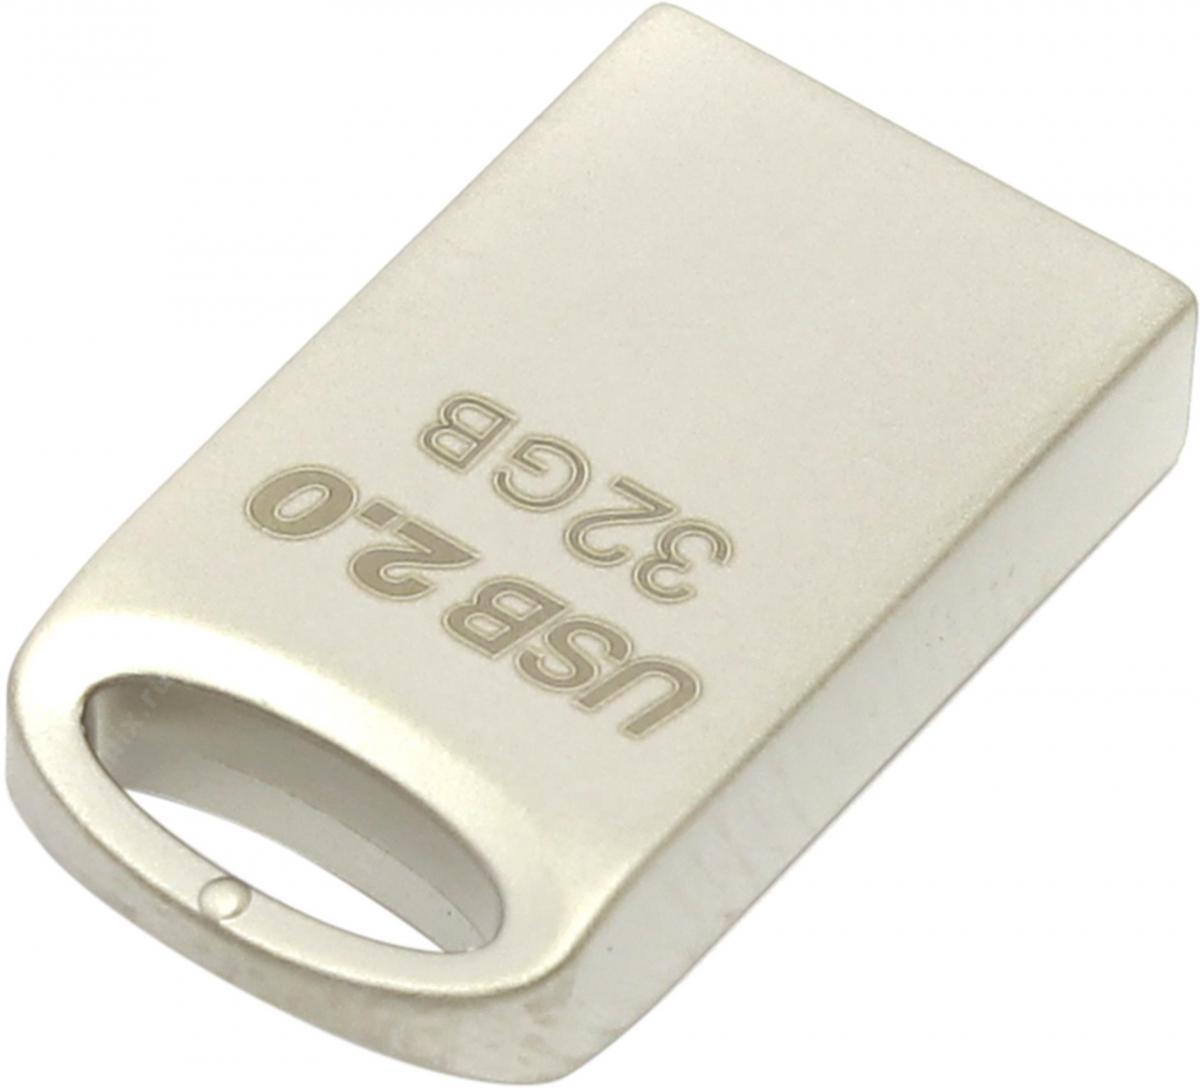 USB флэш накопитель Transcend JetFlash 510S USB 2.0 19MB/s 32Gb серебристый (TS32GJF510S)USB-Flash<br>USB флэш накопитель Transcend JetFlash 510S USB 2.0 19MB/s 32Gb серебристый (TS32GJF510S)<br>